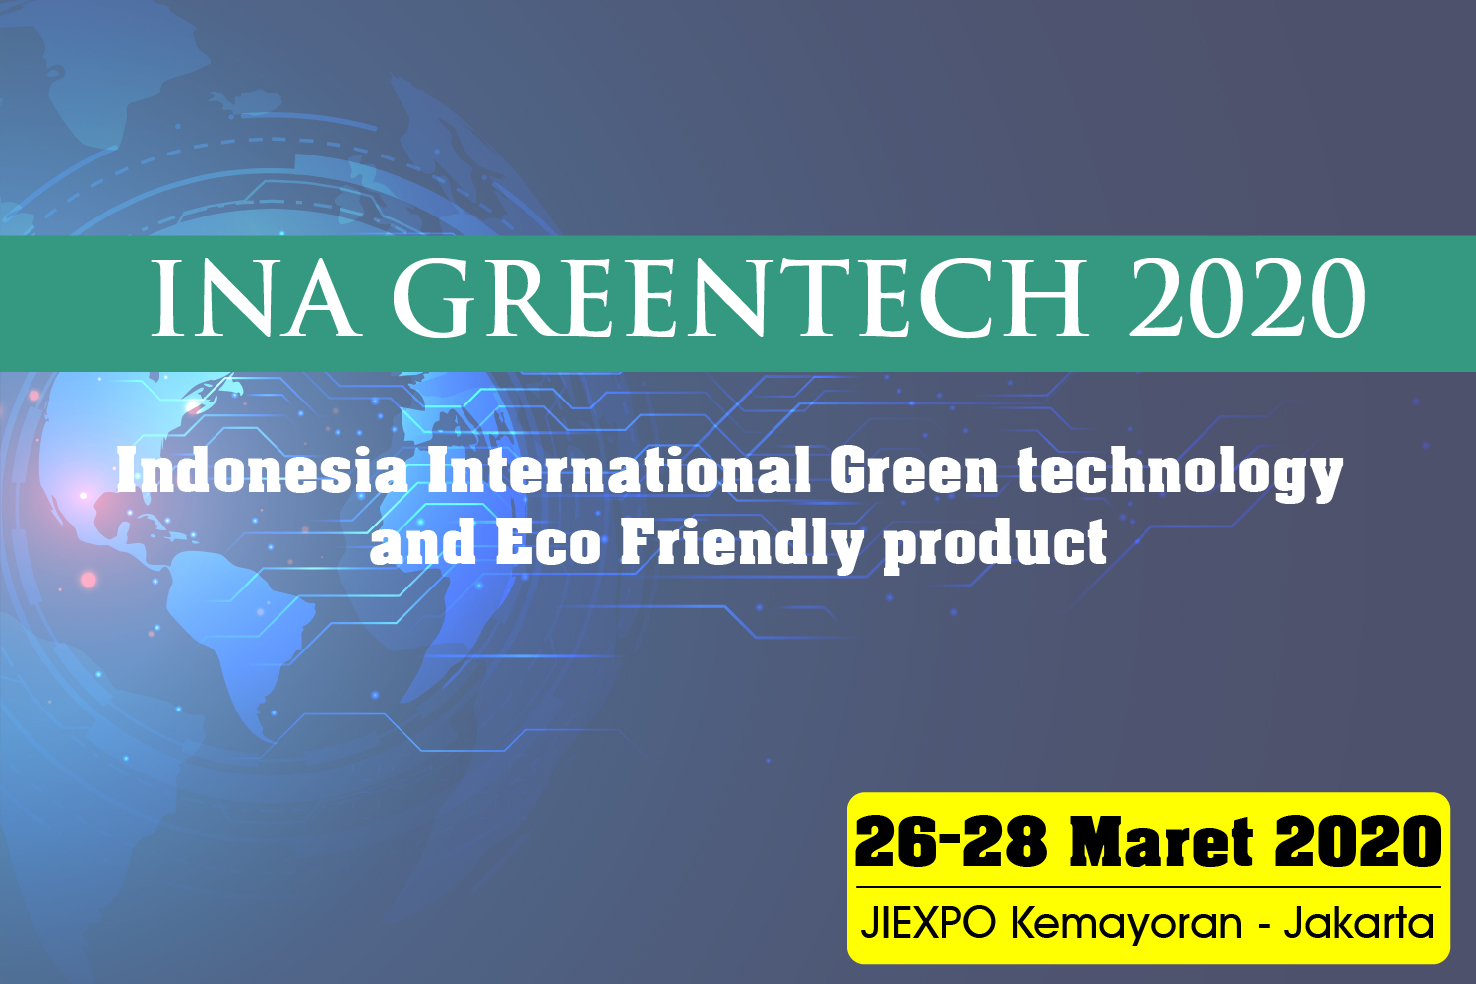 Pameran INA Greentech 26-28 Maret 2020 di JIEXPO Kemayoran Jakarta